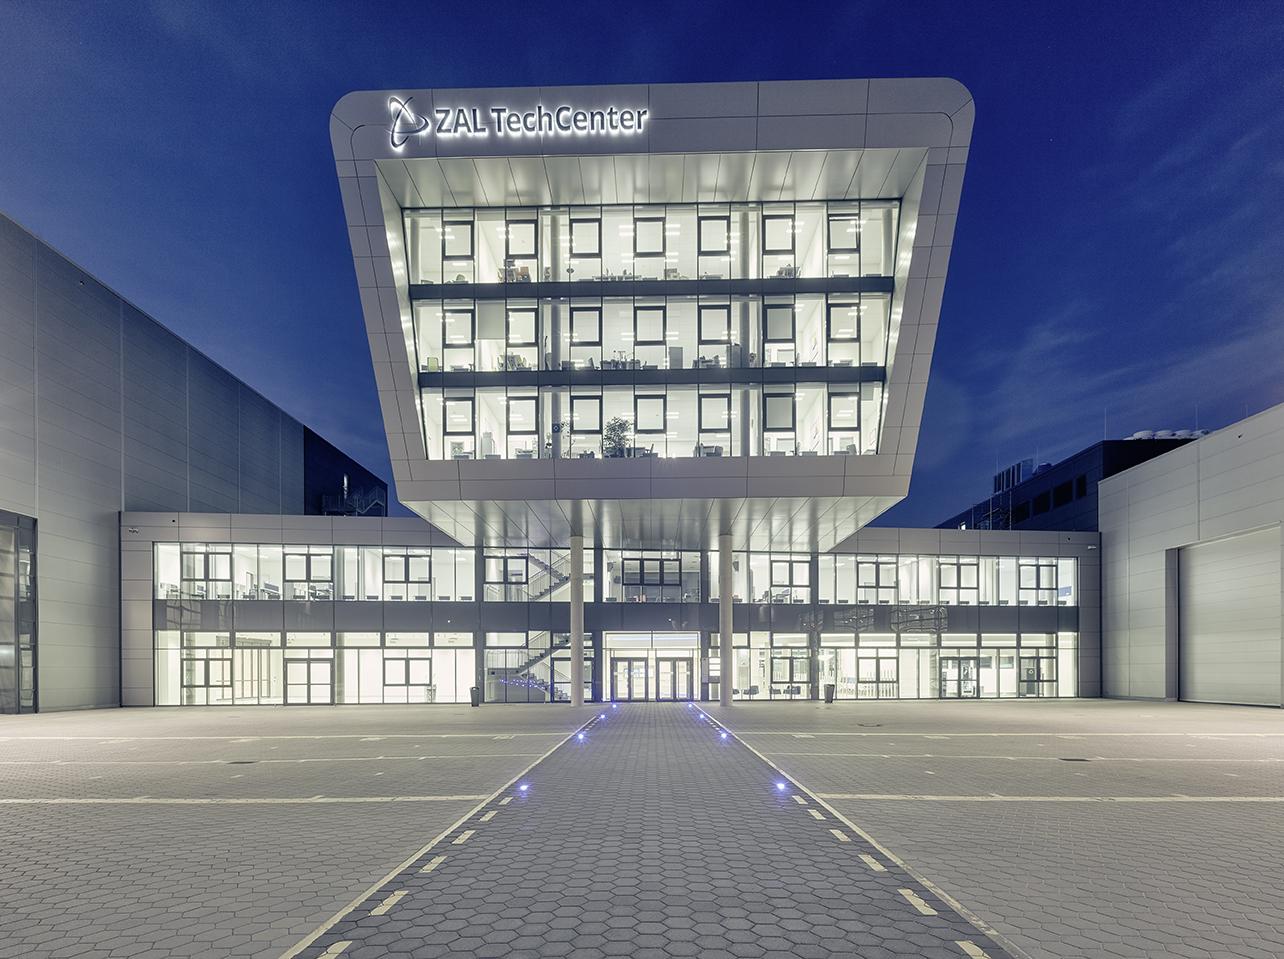 ZAL TechCenter